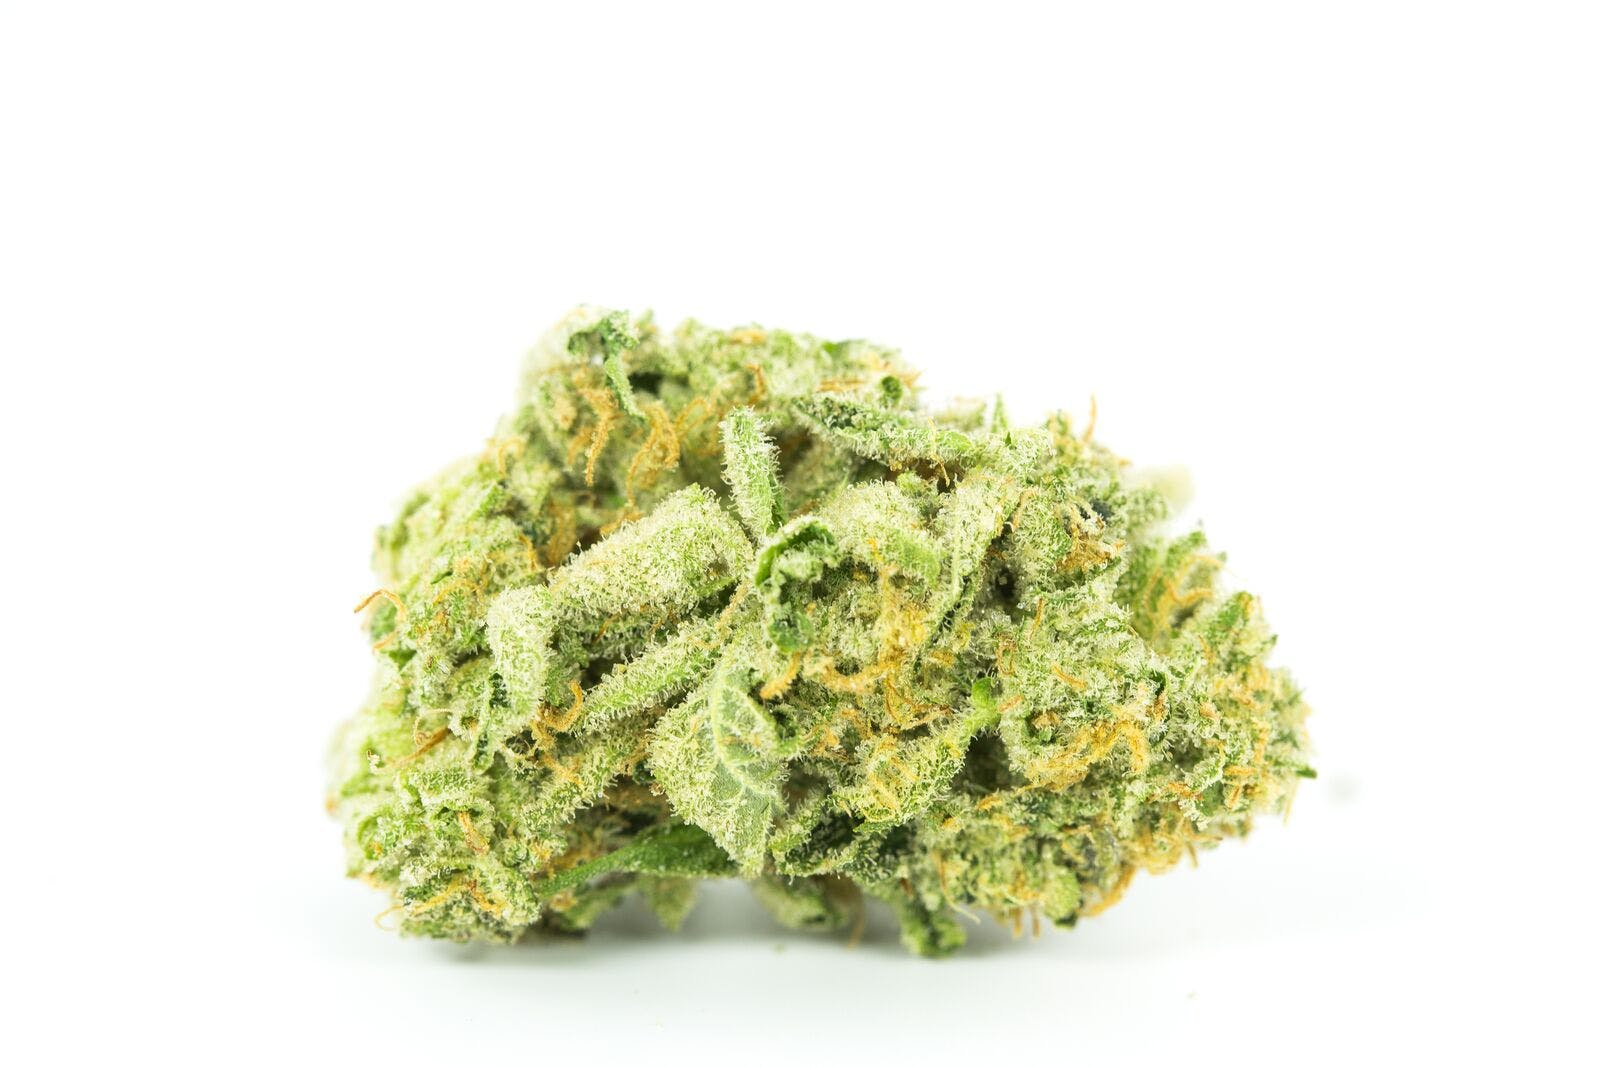 Kraken Weed; Kraken Cannabis Strain; Kraken Indica Marijuana Strain